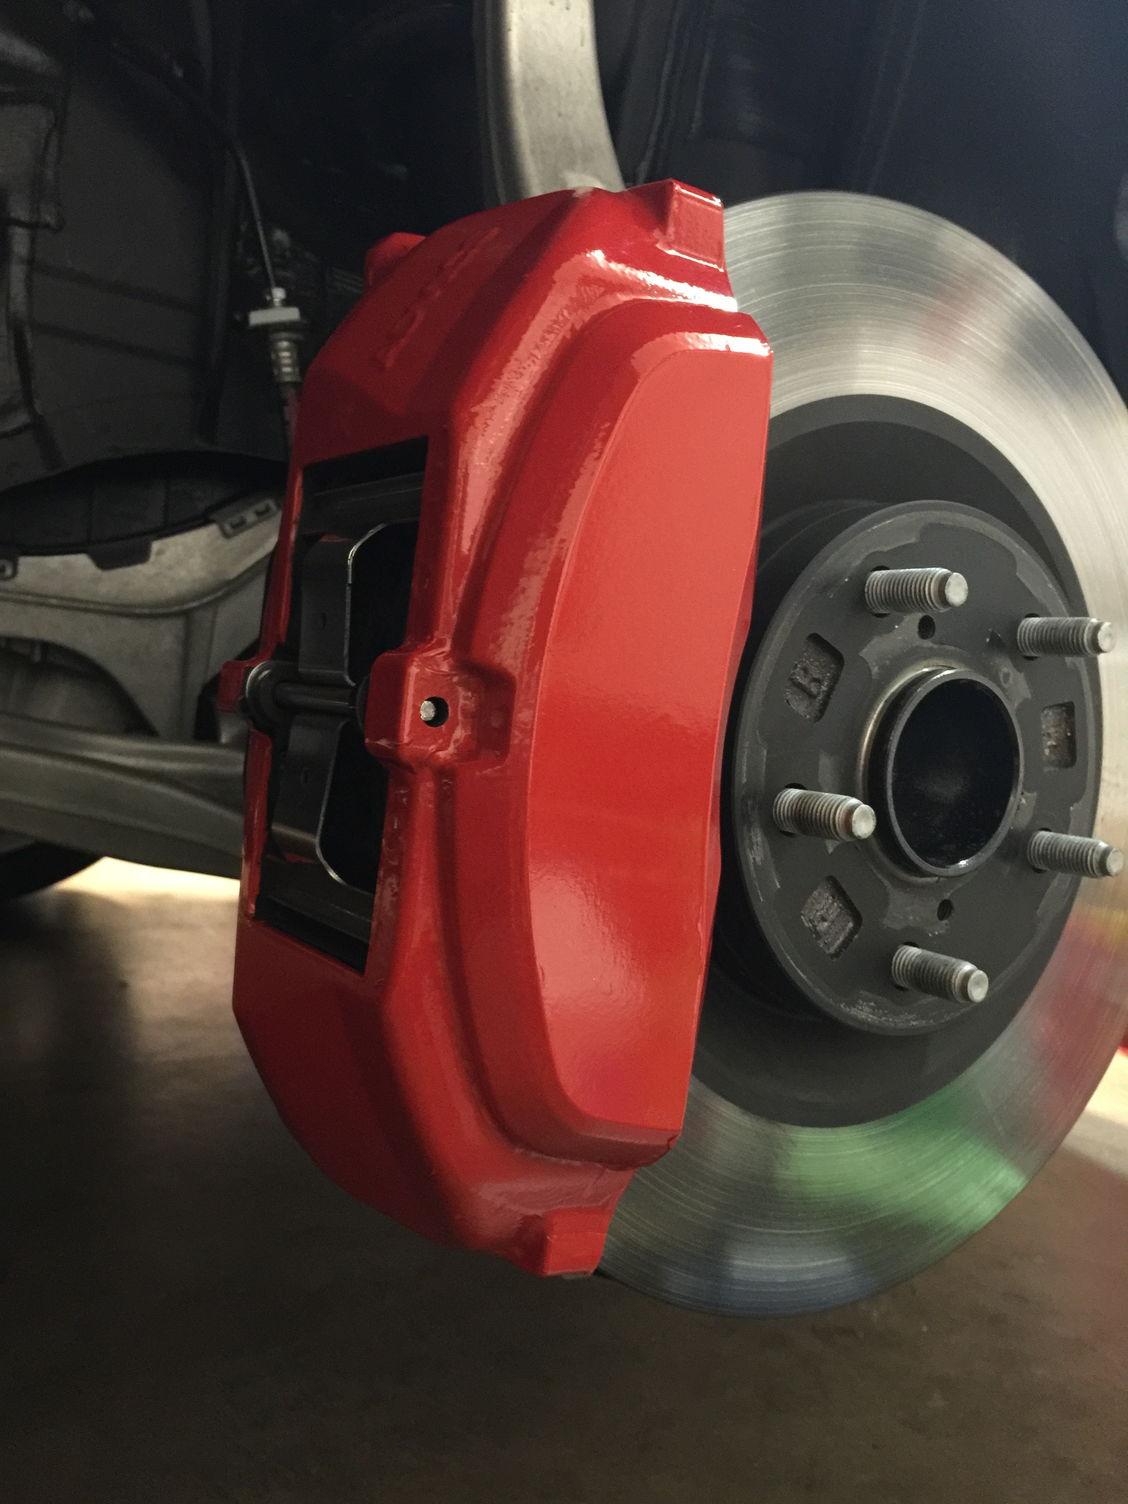 3m Reflective Red Brake Caliper Vinyl Wrap Clublexus